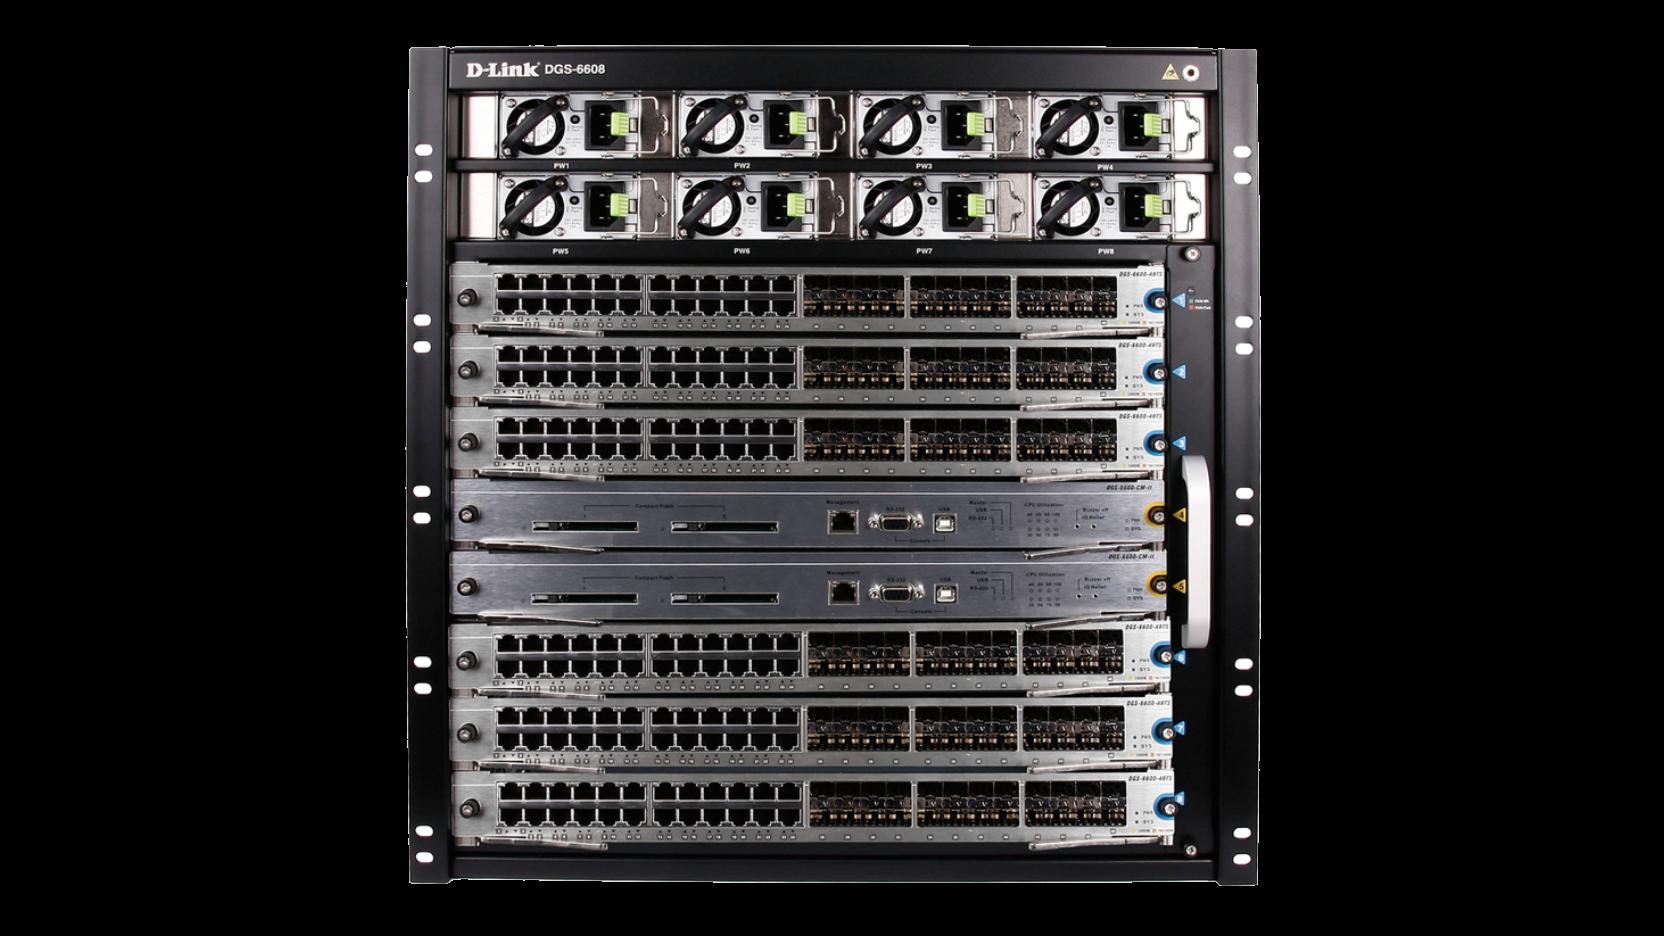 D-Link DGS-6604 Switch Driver